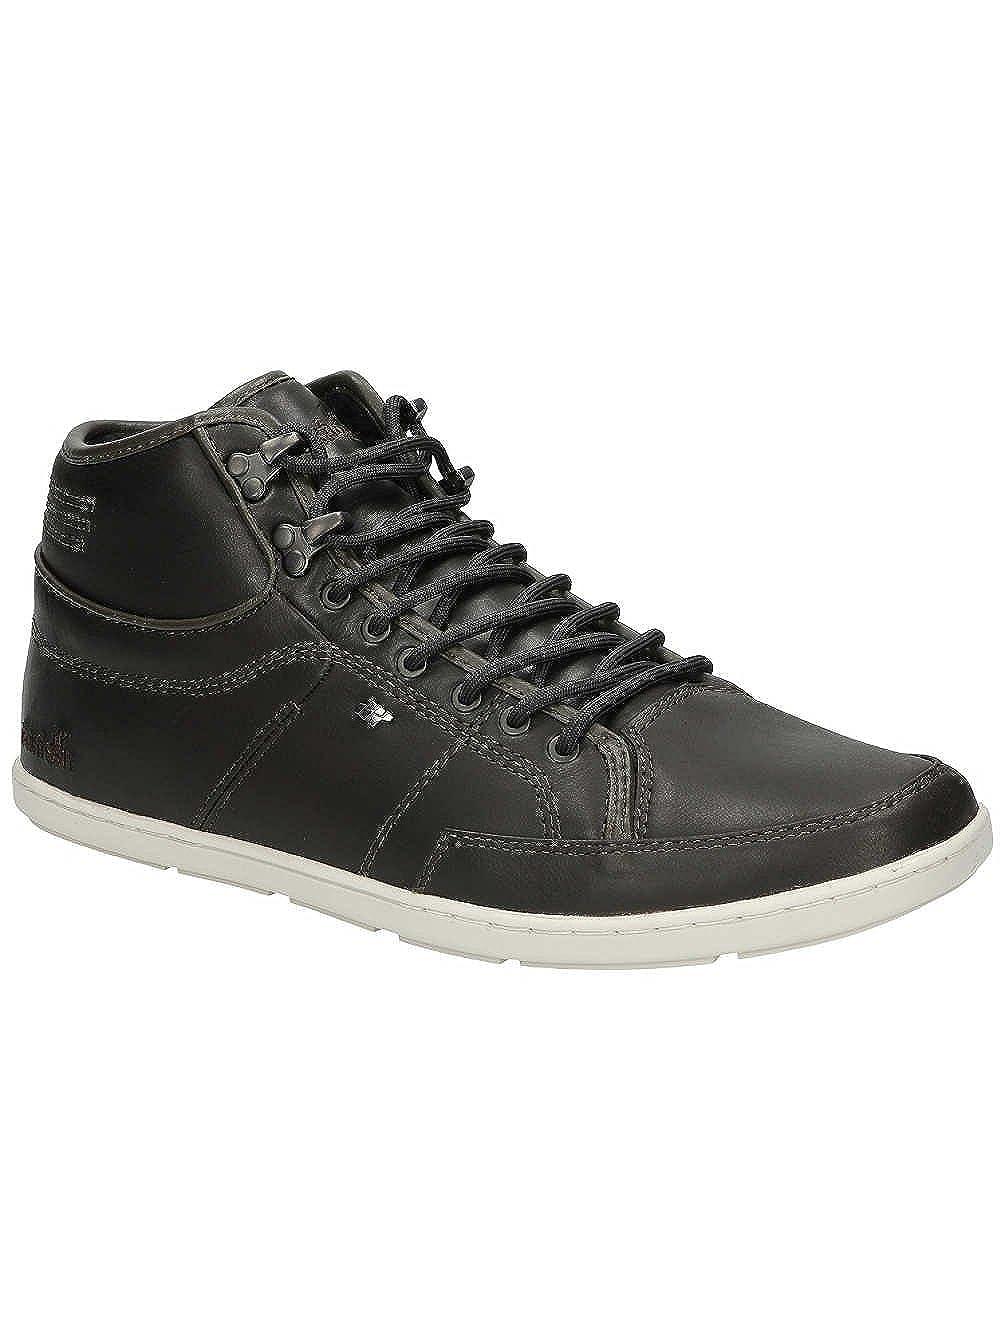 Boxfresh Herren Swapp 3 Hohe Sneaker E15247